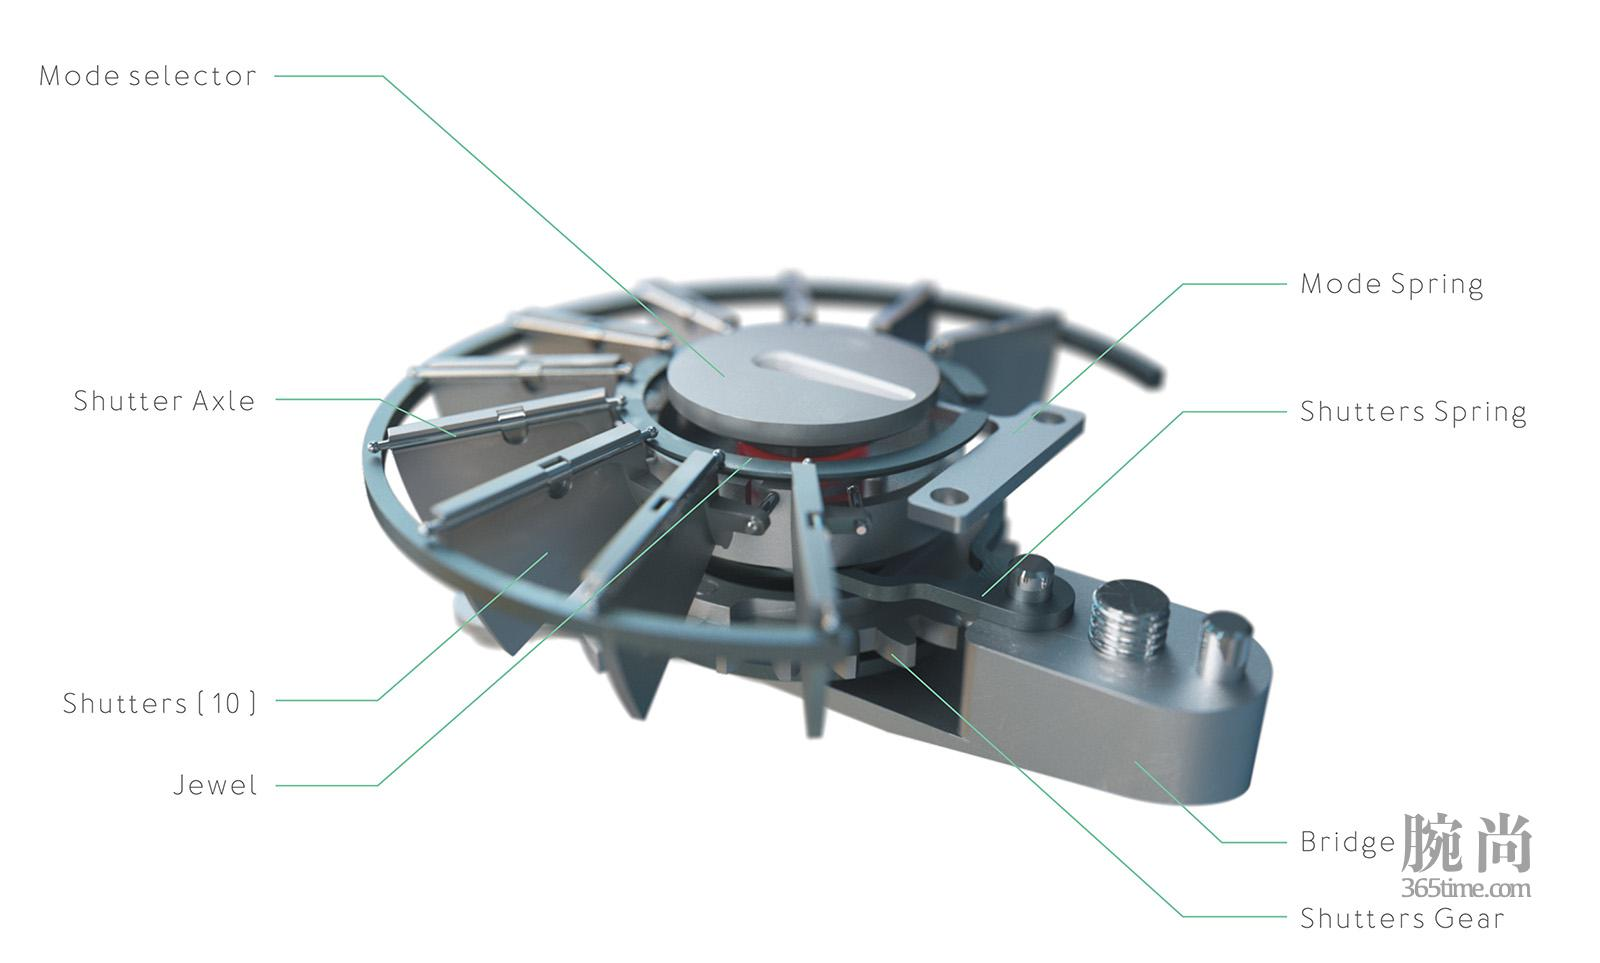 Ressence_e-Crown-Photovoltaic-Shutters.jpg